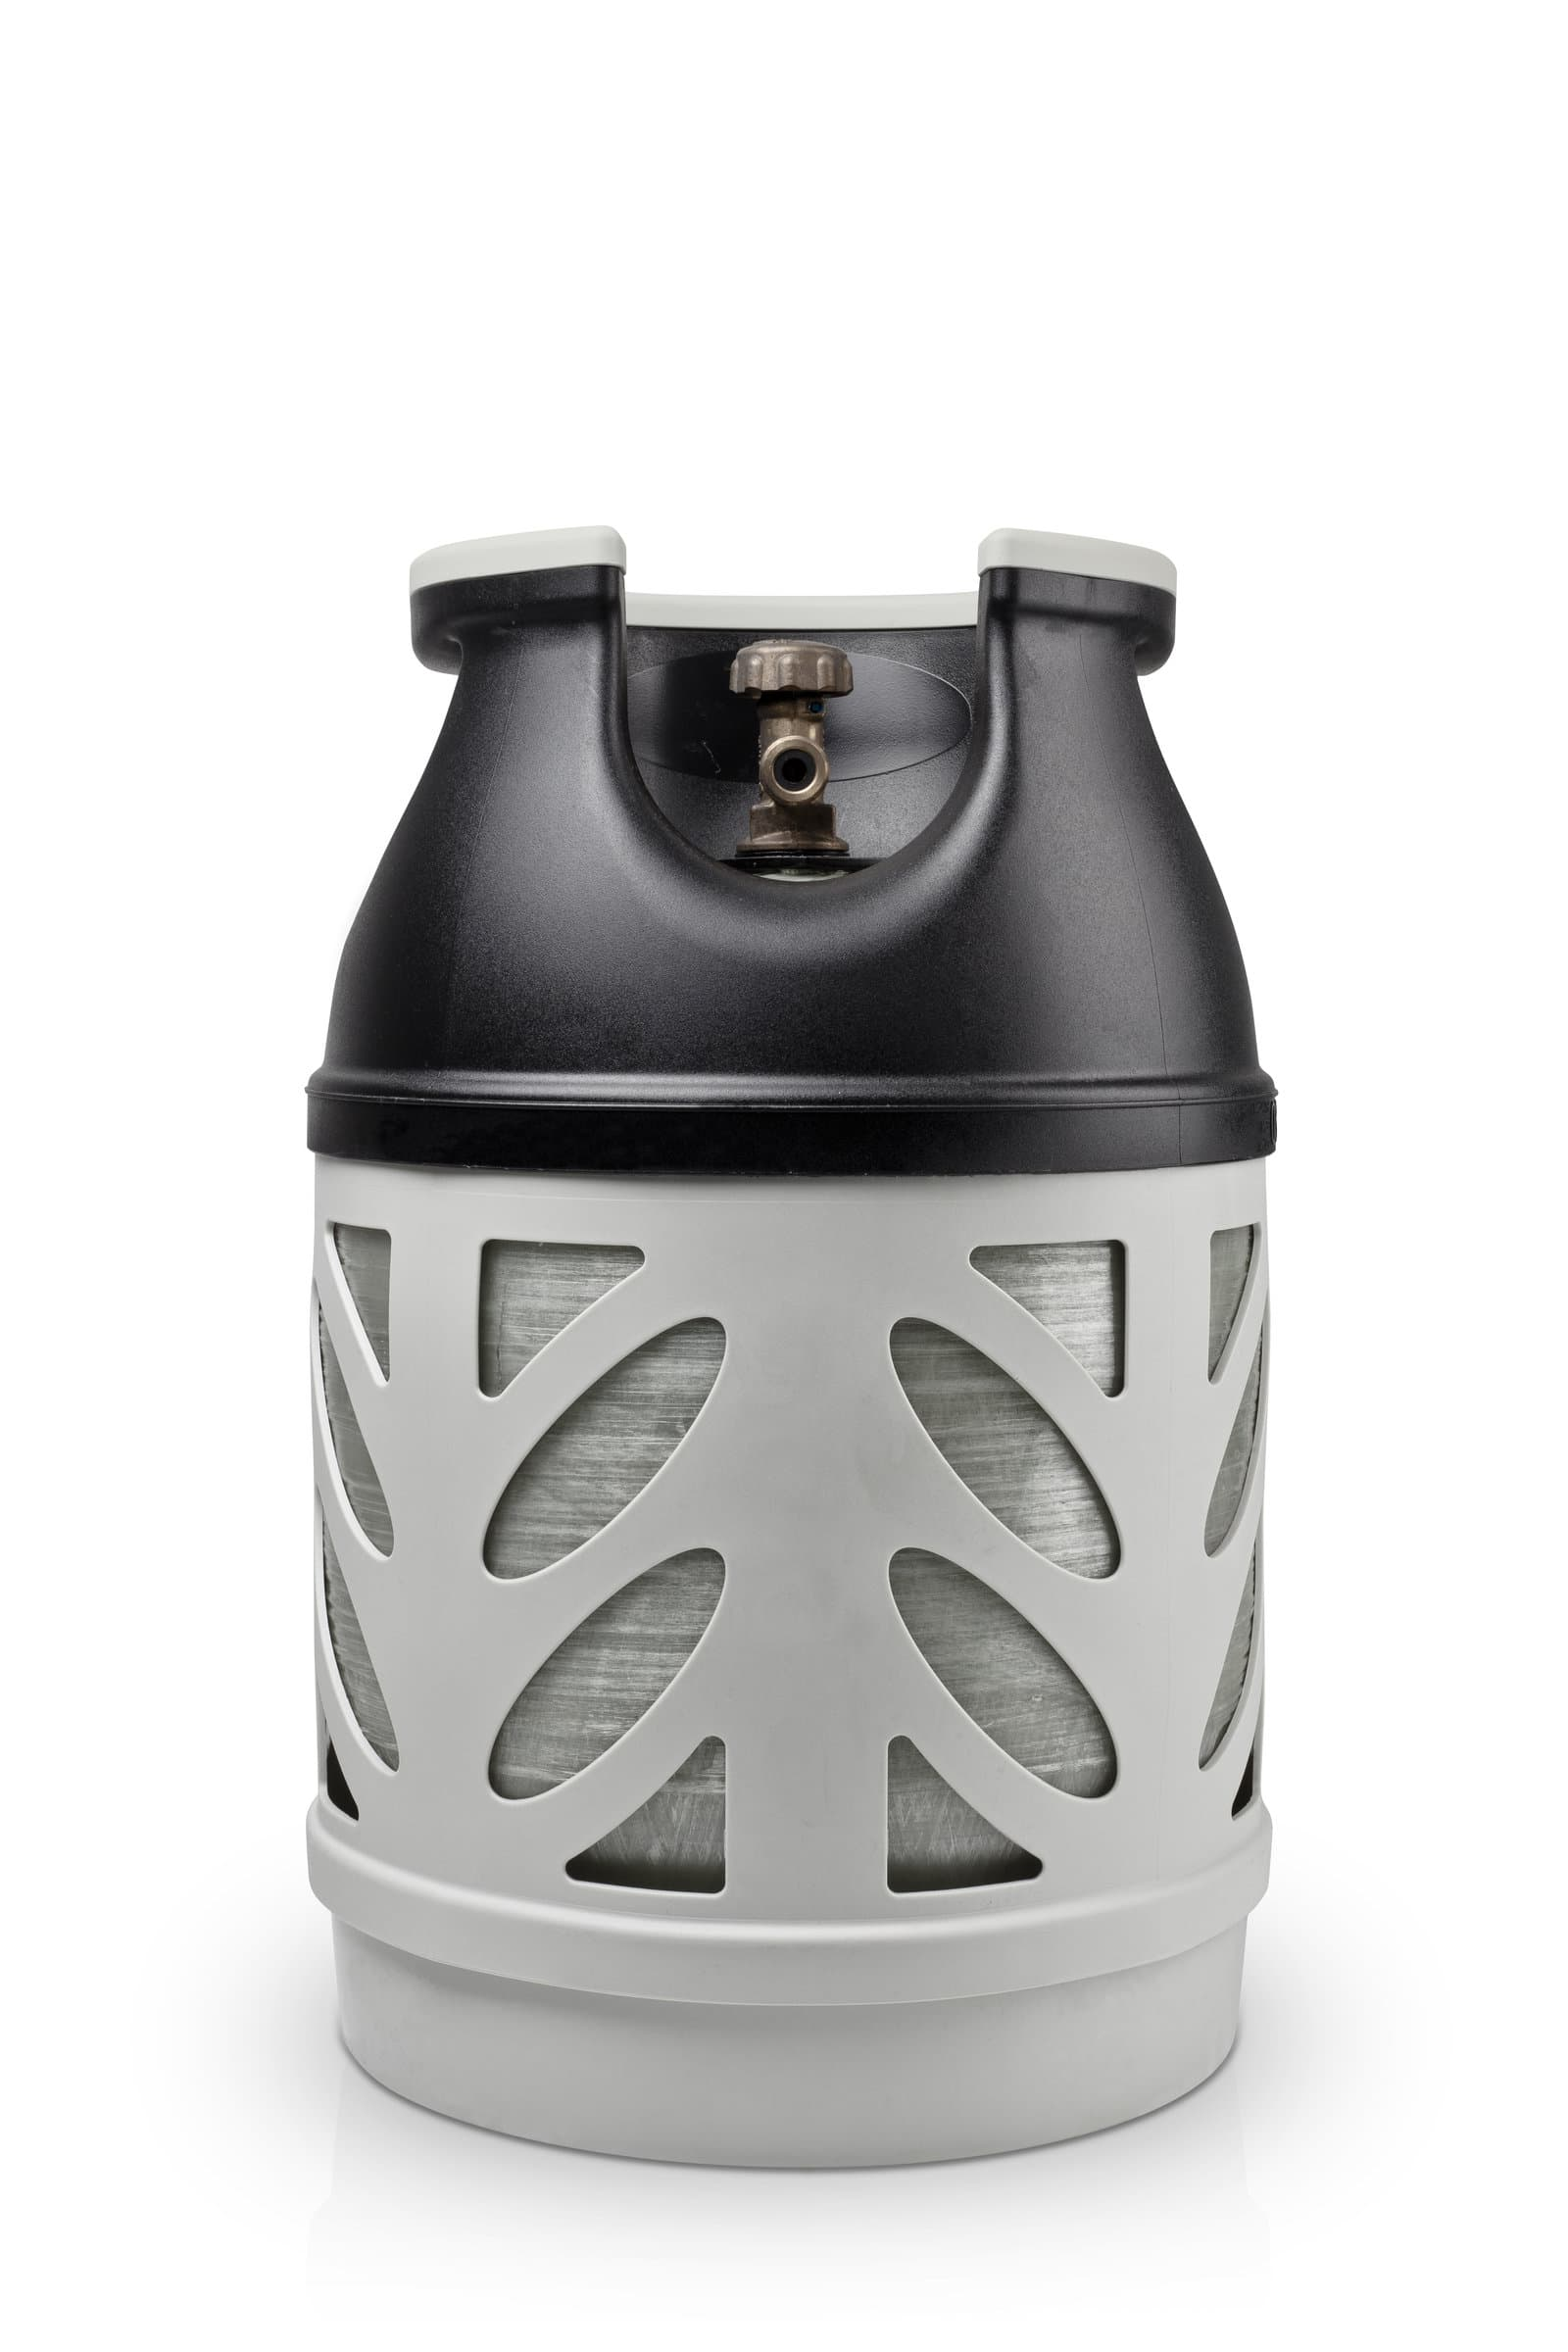 socar bouteille en composite de gaz propane consign e 7 5 kg vide migros. Black Bedroom Furniture Sets. Home Design Ideas